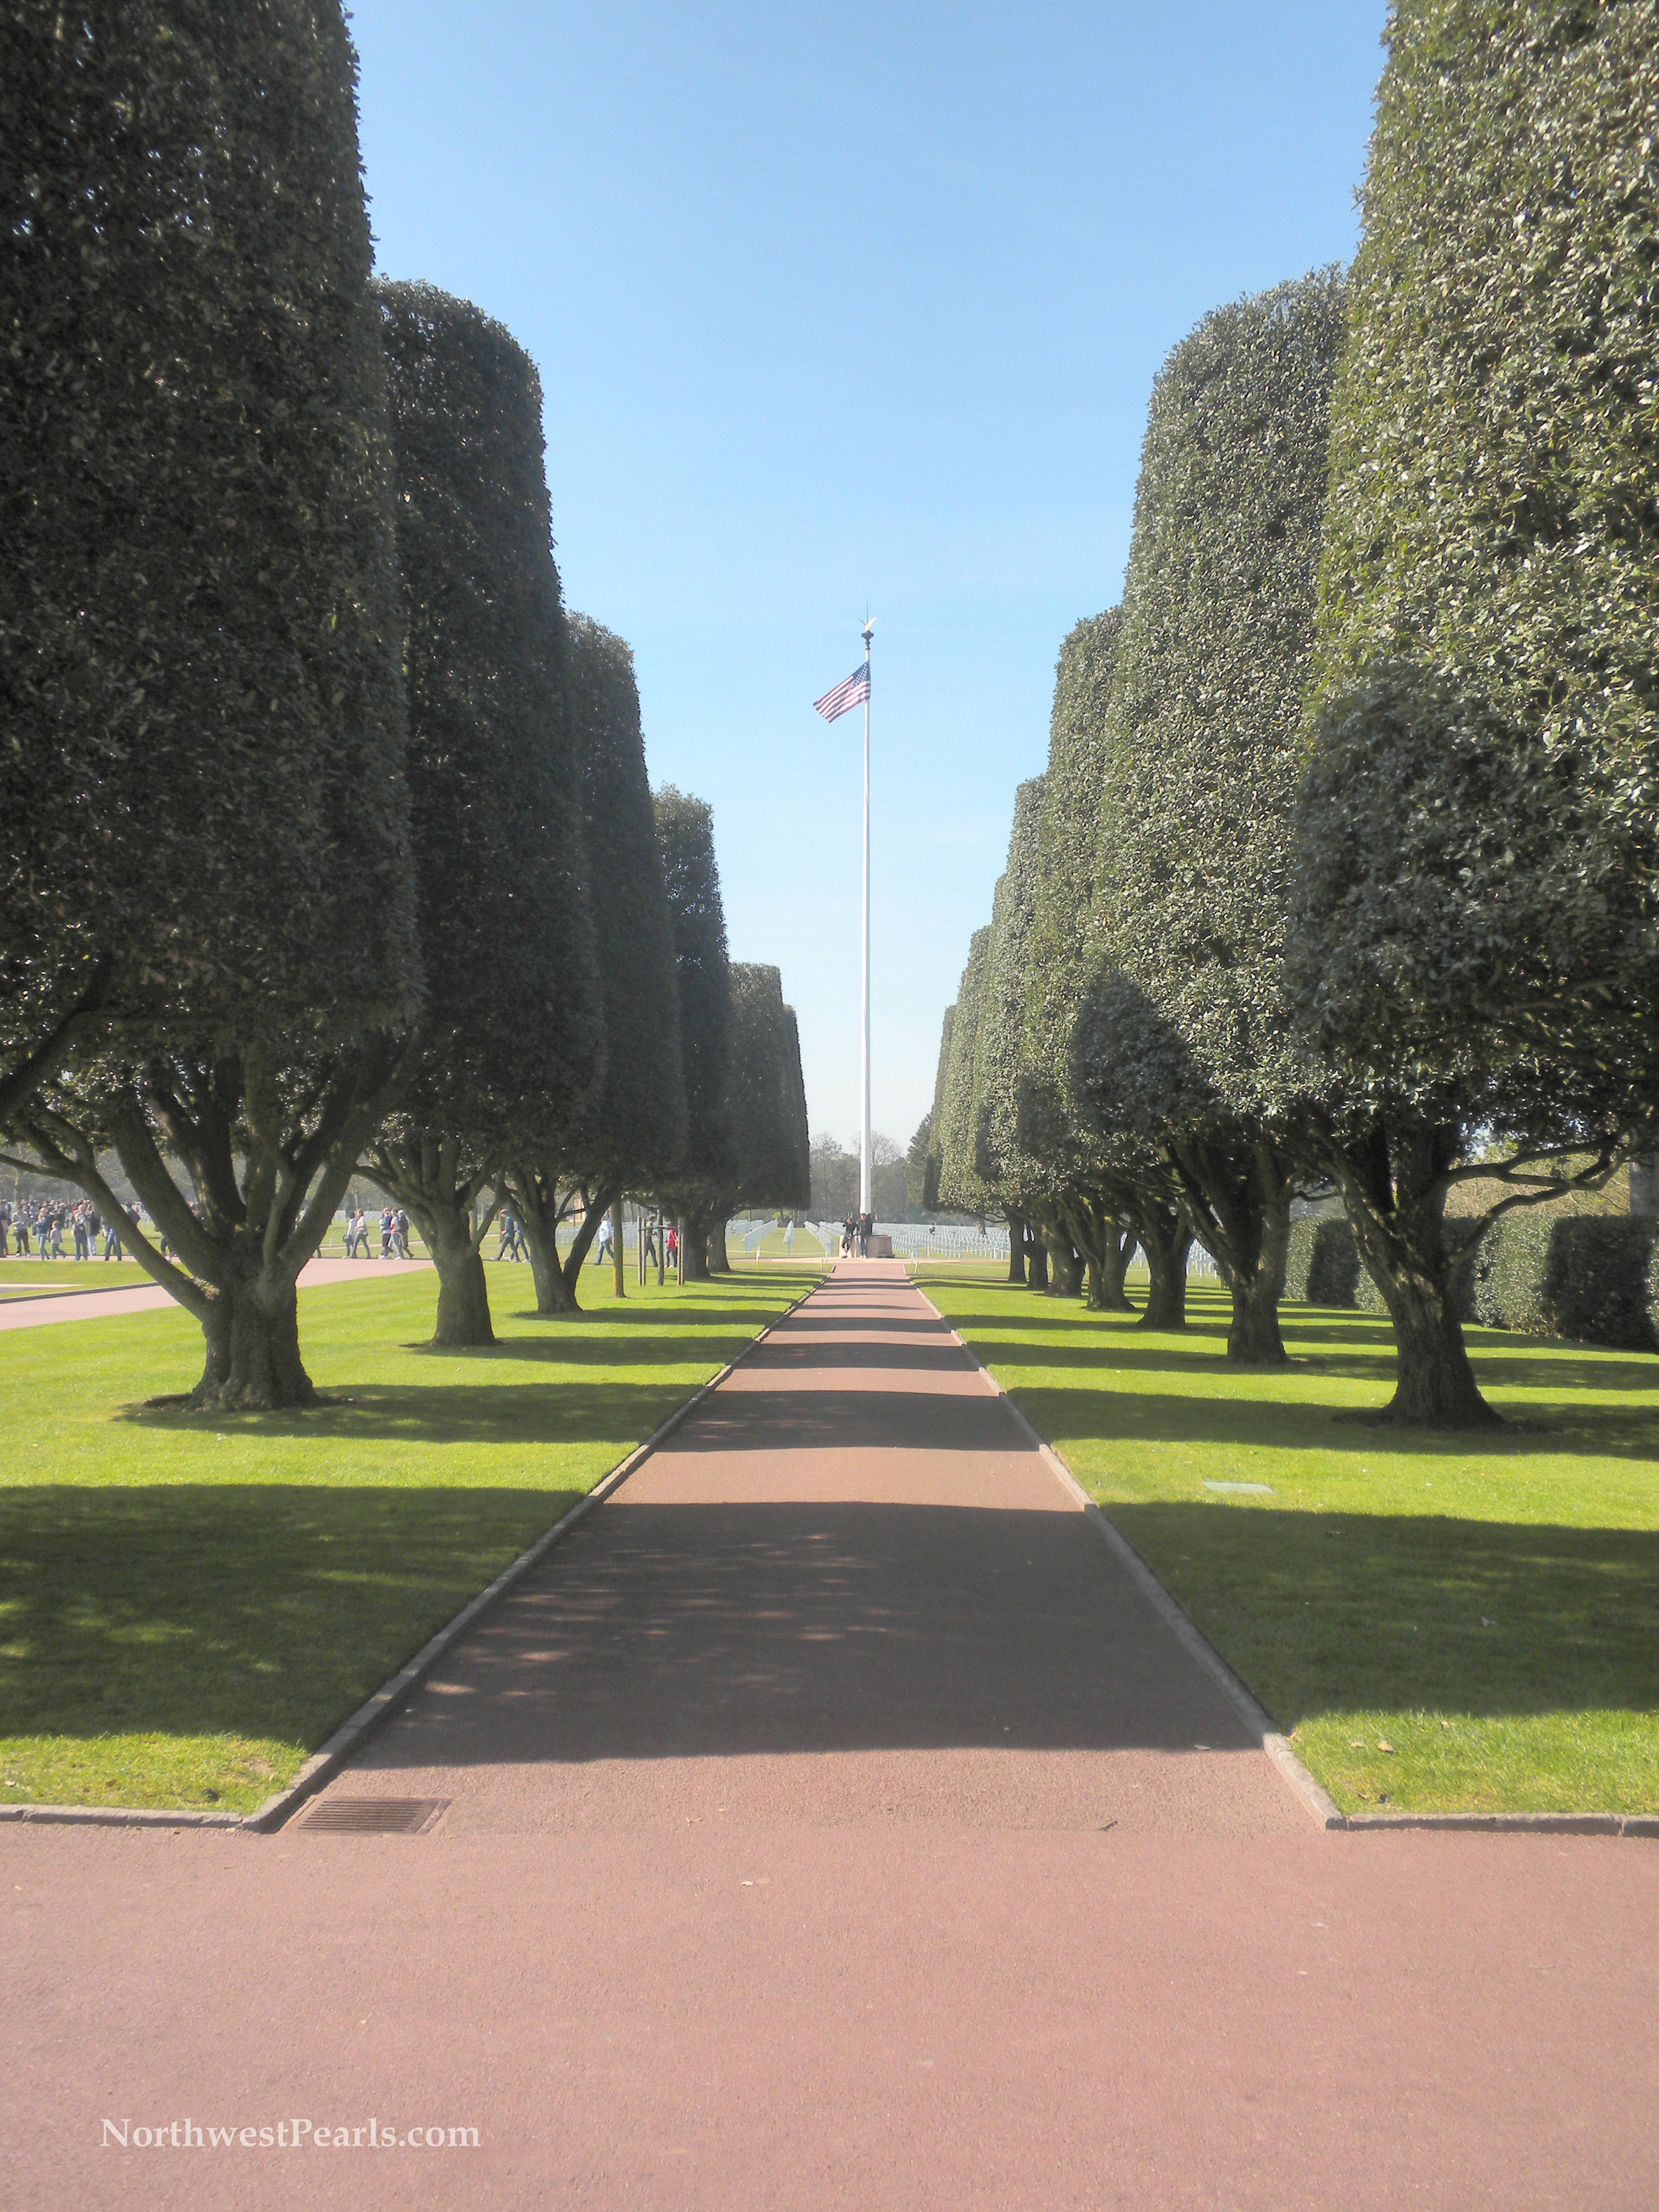 Northwest Pearls: Veterans Day